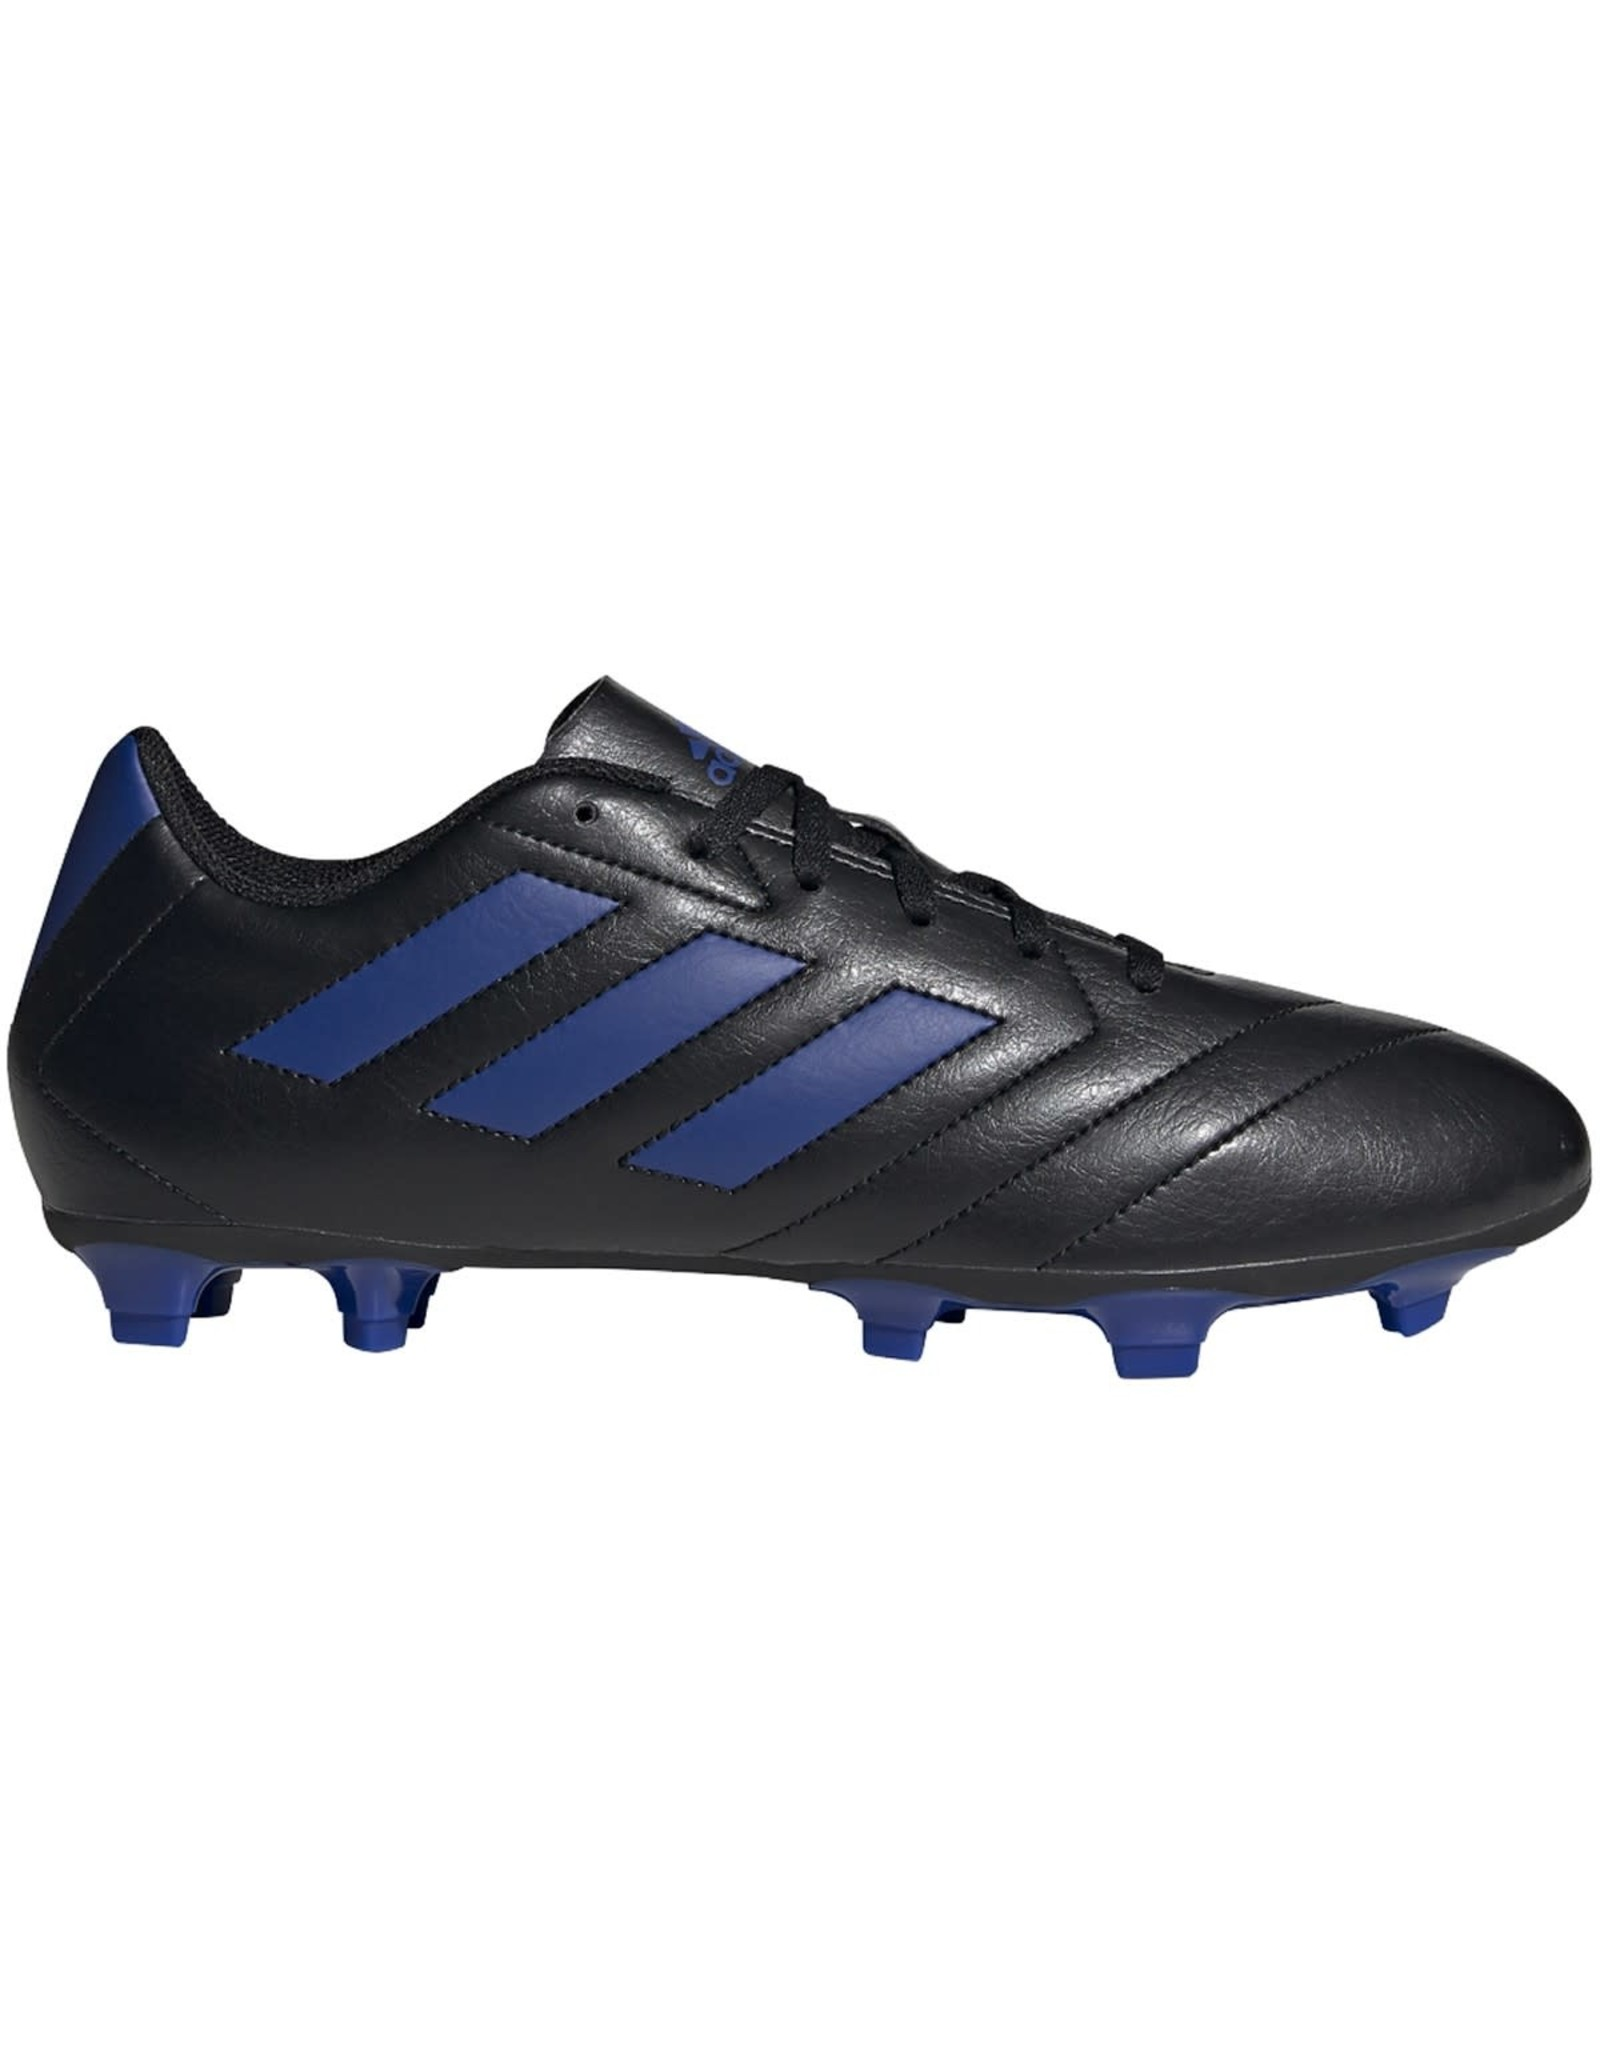 Adidas ADIDAS GOLETTO VII FG J